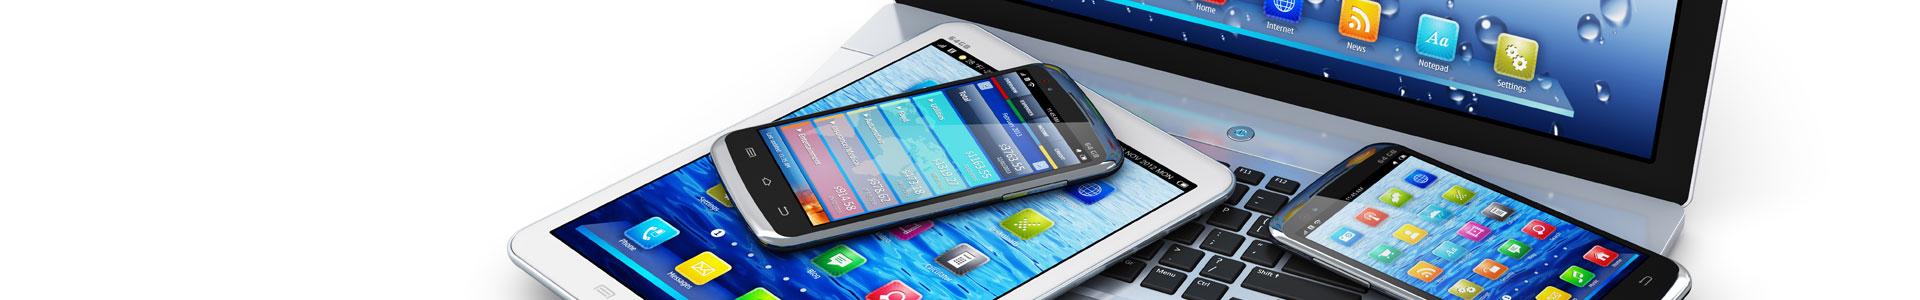 IT-OK Hardware Schijndel webshop iphone galaxy samsung